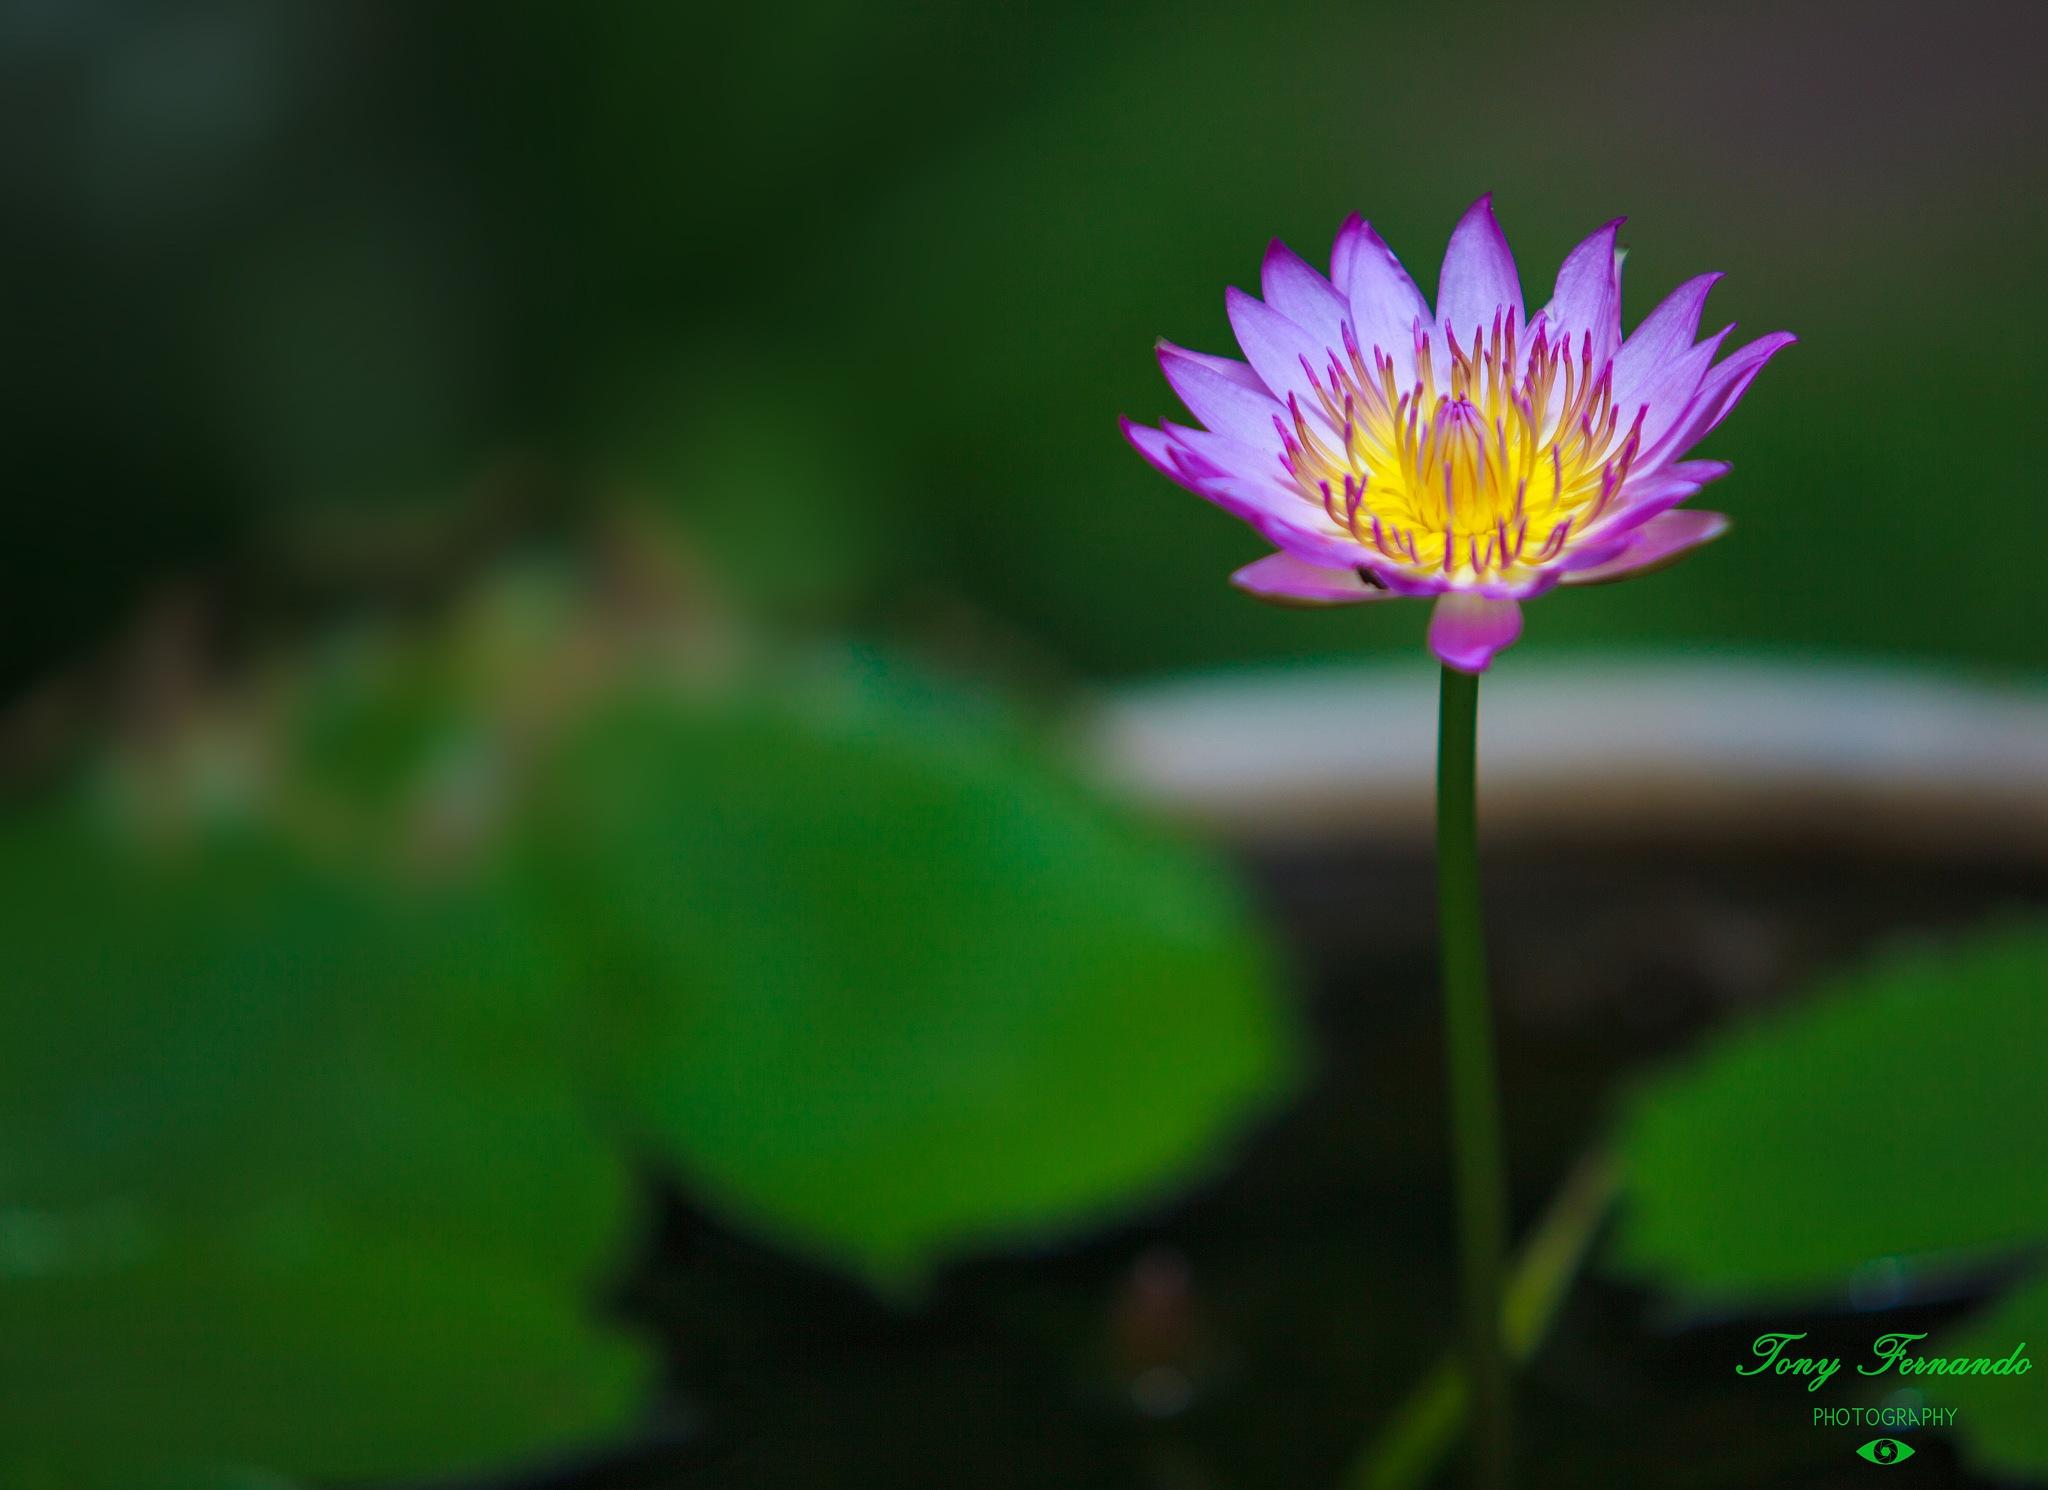 Blue Lotus - Nymphaea nouchali, often known by its synonym Nymphaea stellata. by Tony Fernando